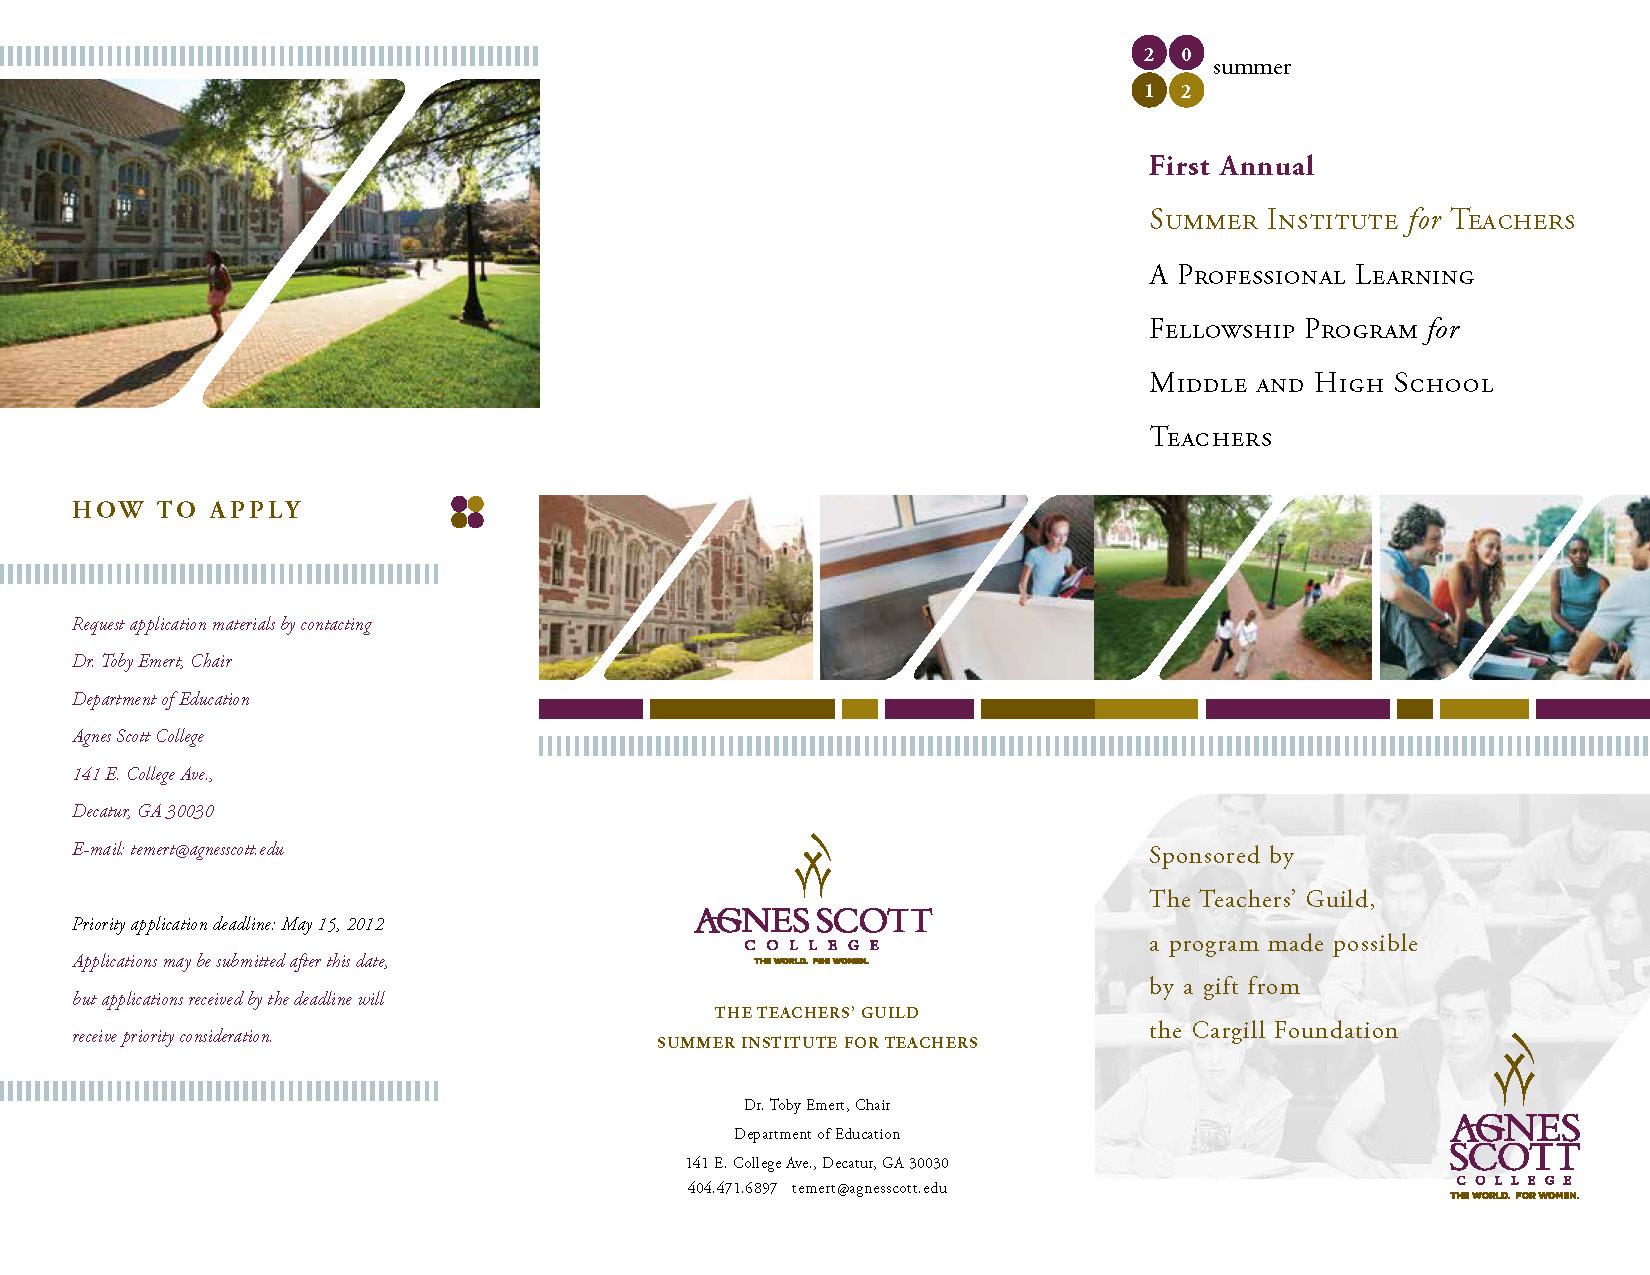 Agnes Scott College Conference for Teachers Brochure